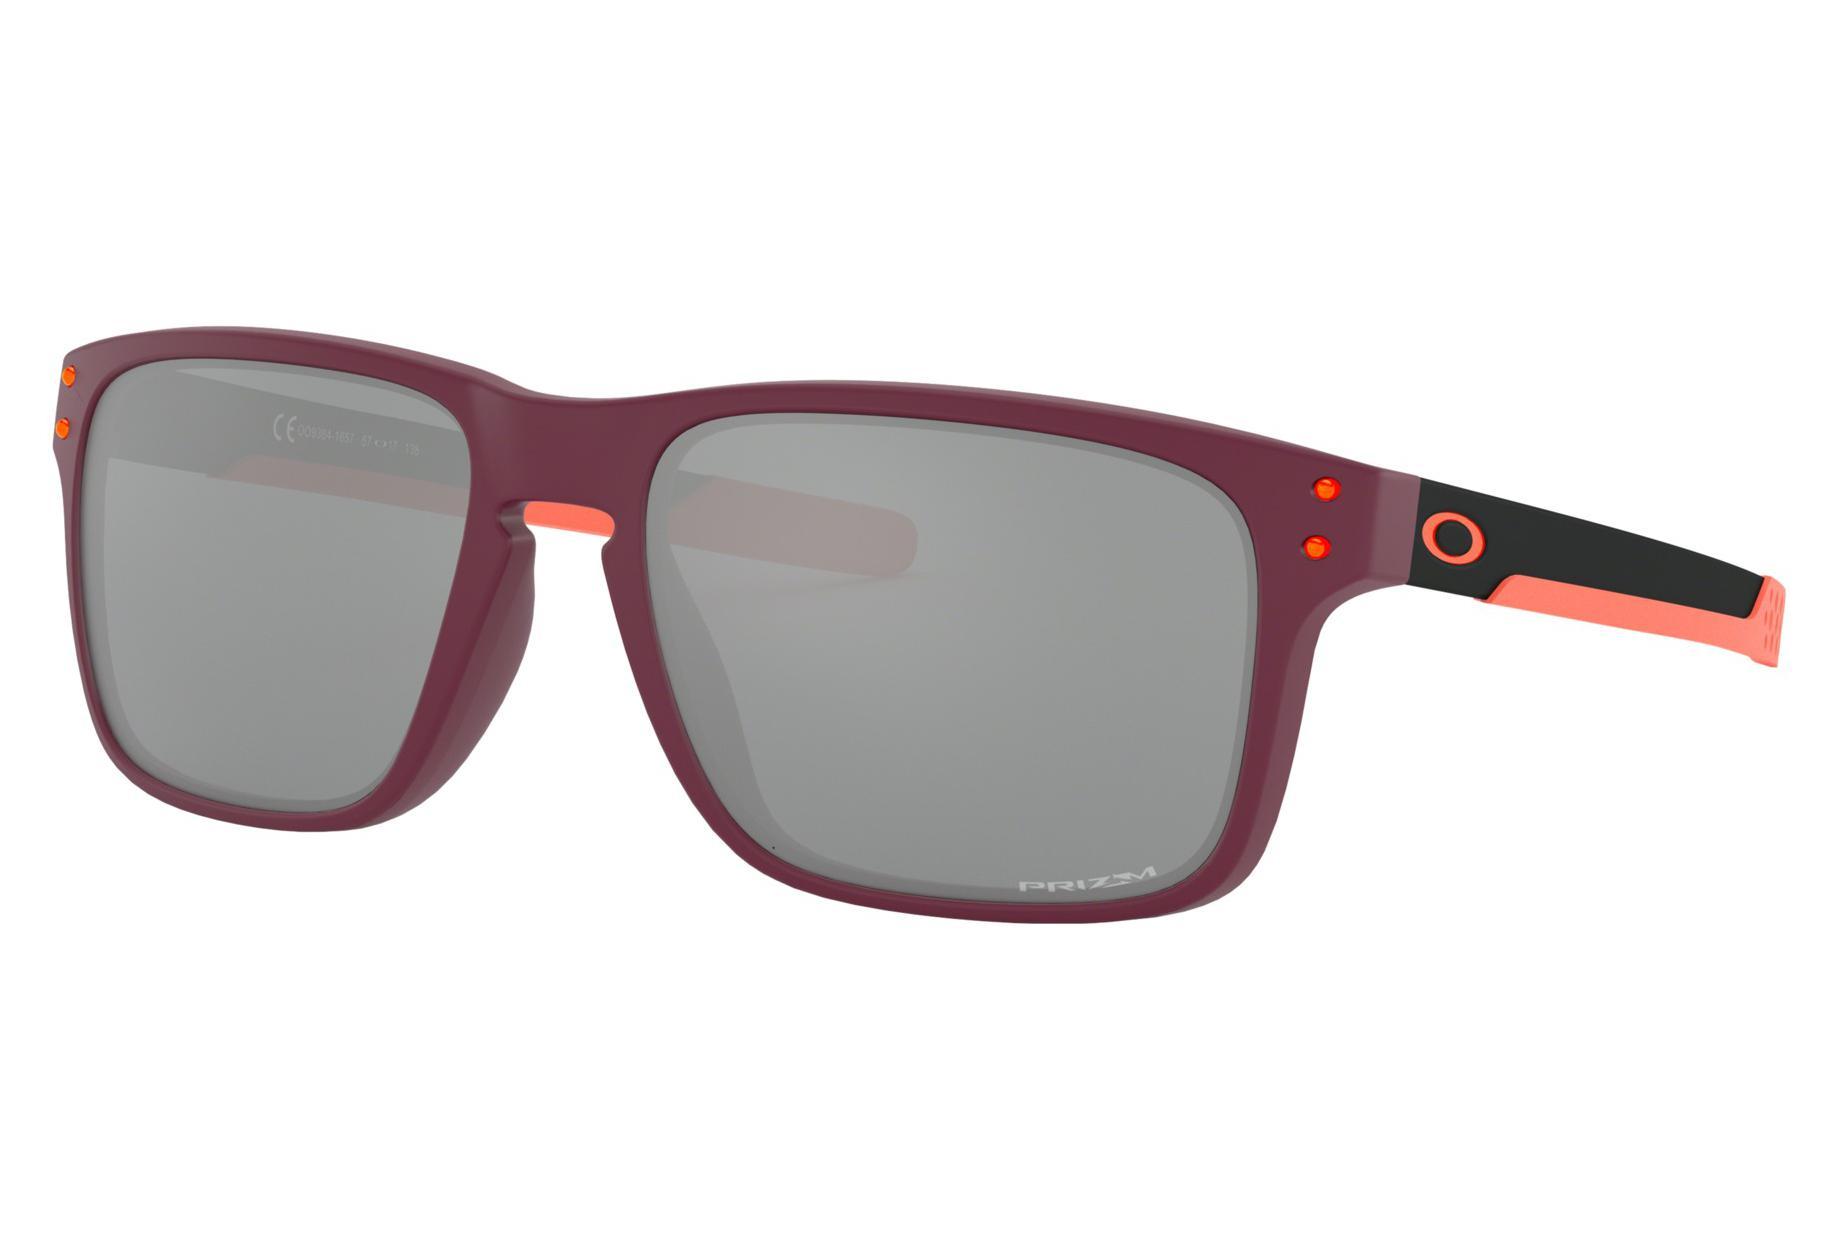 Gafas De Mix Vampirella Holbrook Oakley Sol Ember Collection Mate 08OPkwnX